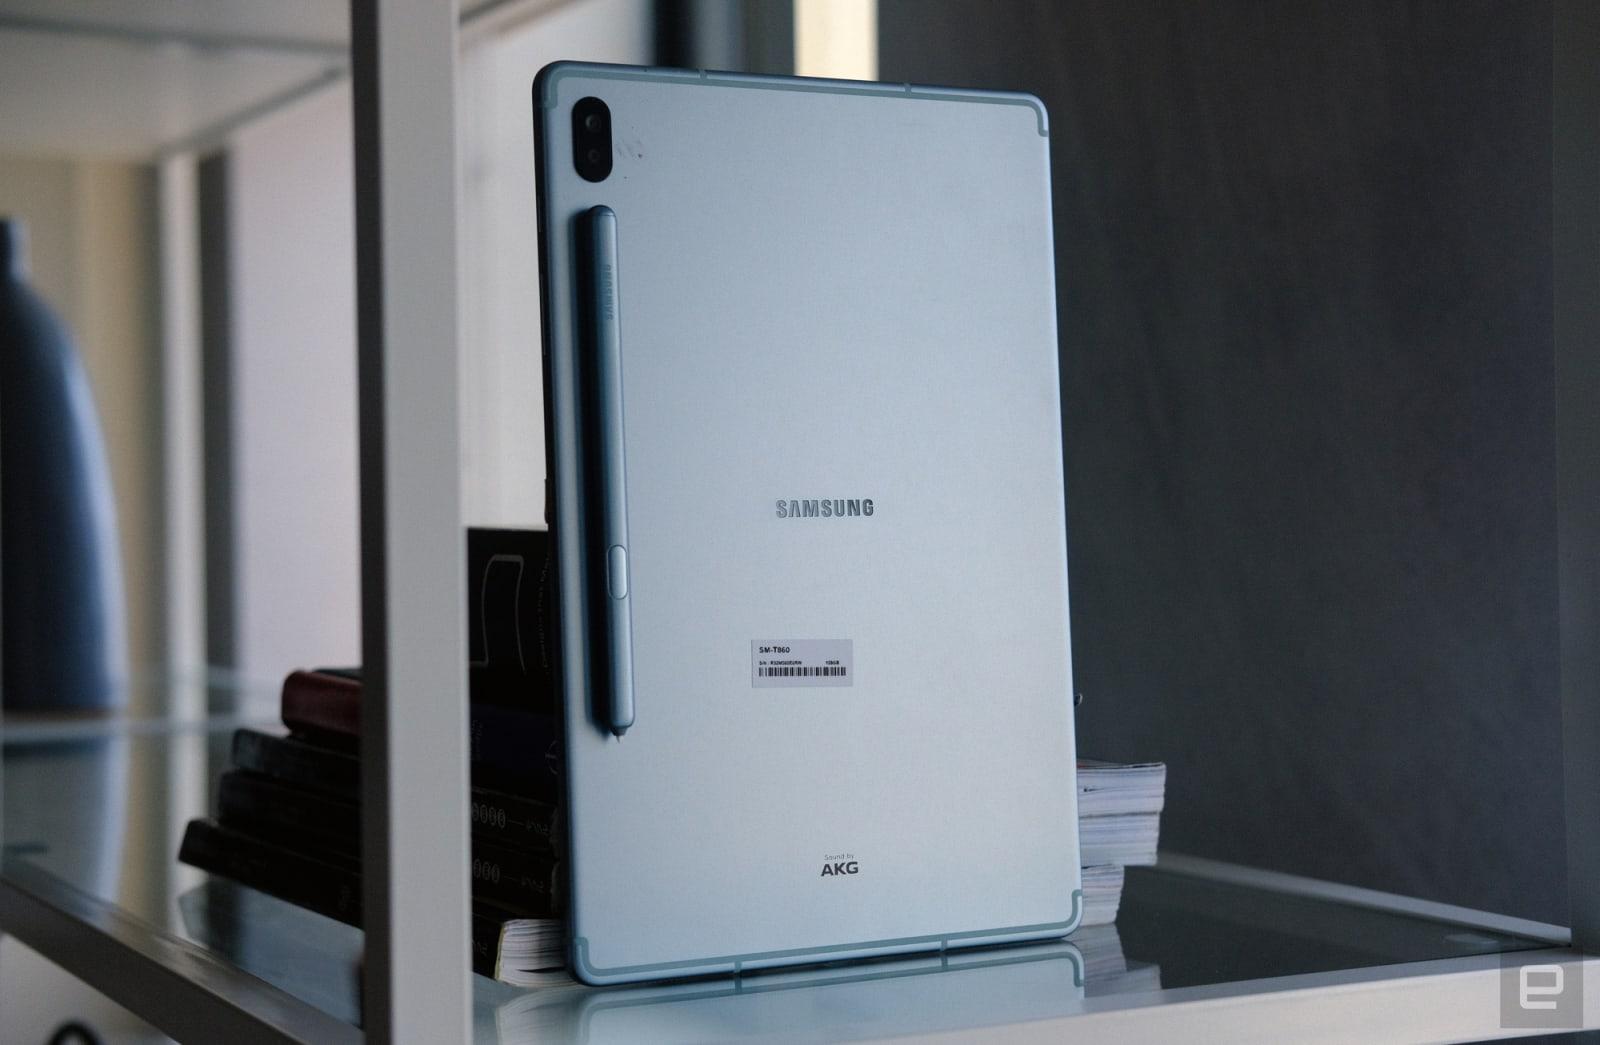 Samsung Galaxy Tab S6 hands-on